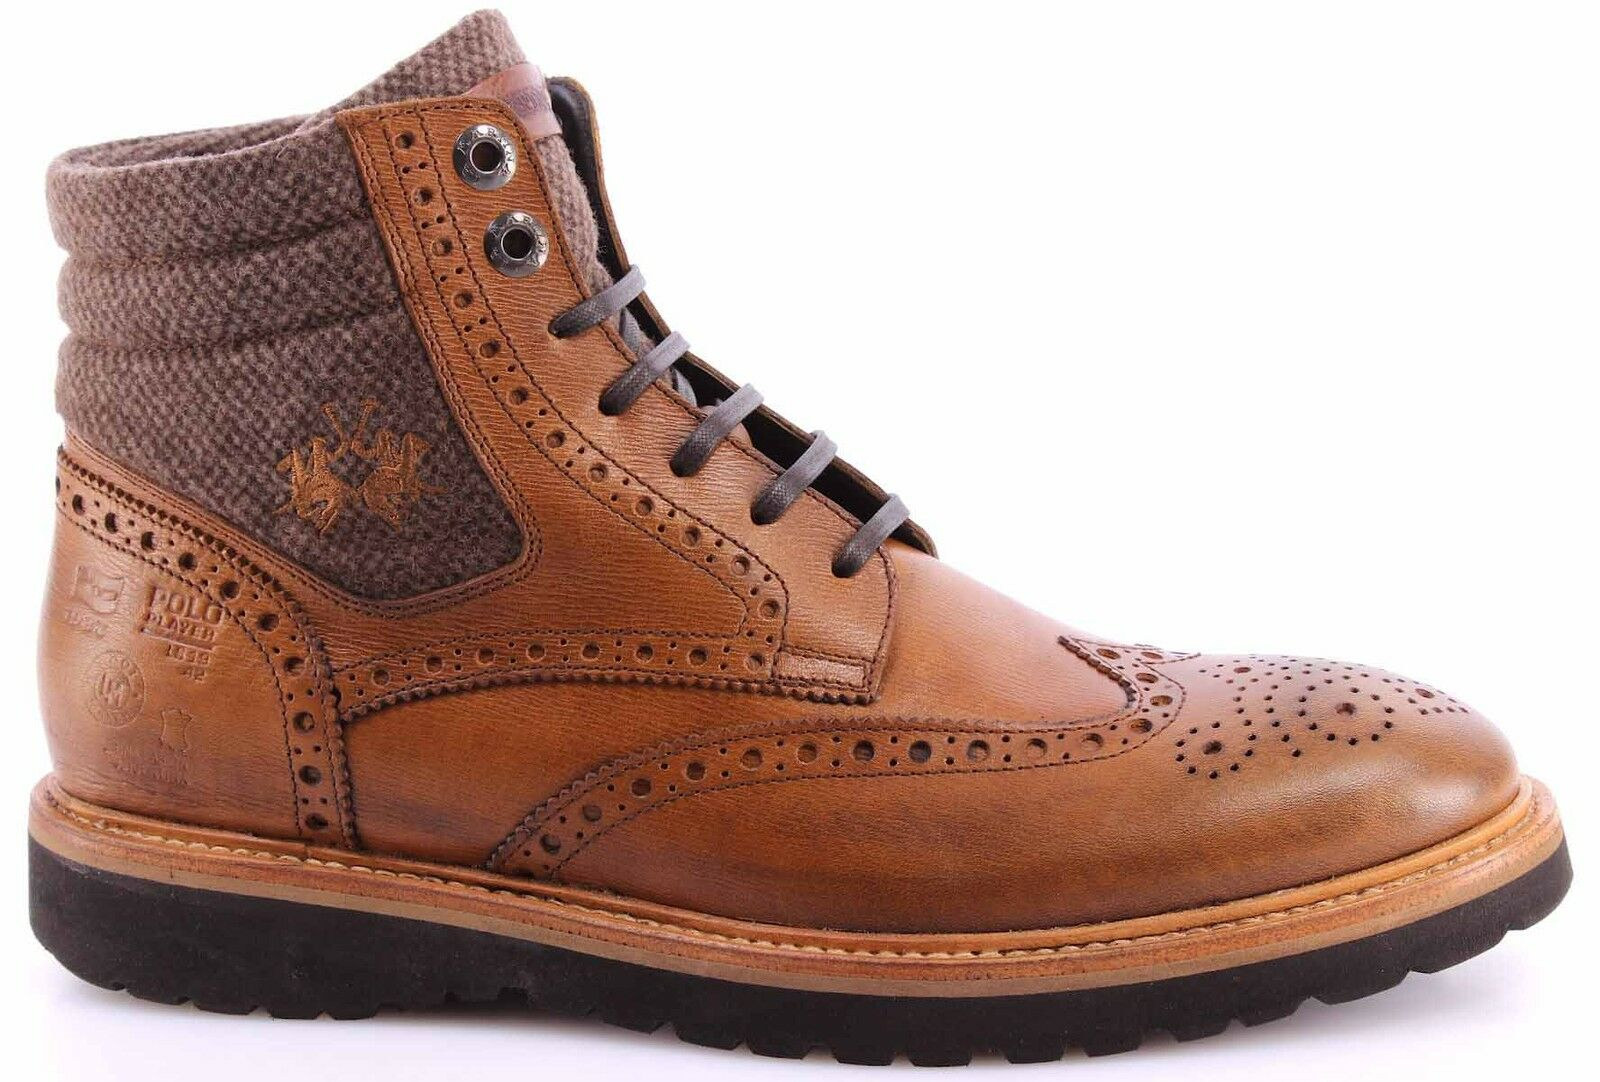 Scarpe Stivaletto Ankle Boots Uomo LA MARTINA L9020116 Franz Timber Tex Sherwood